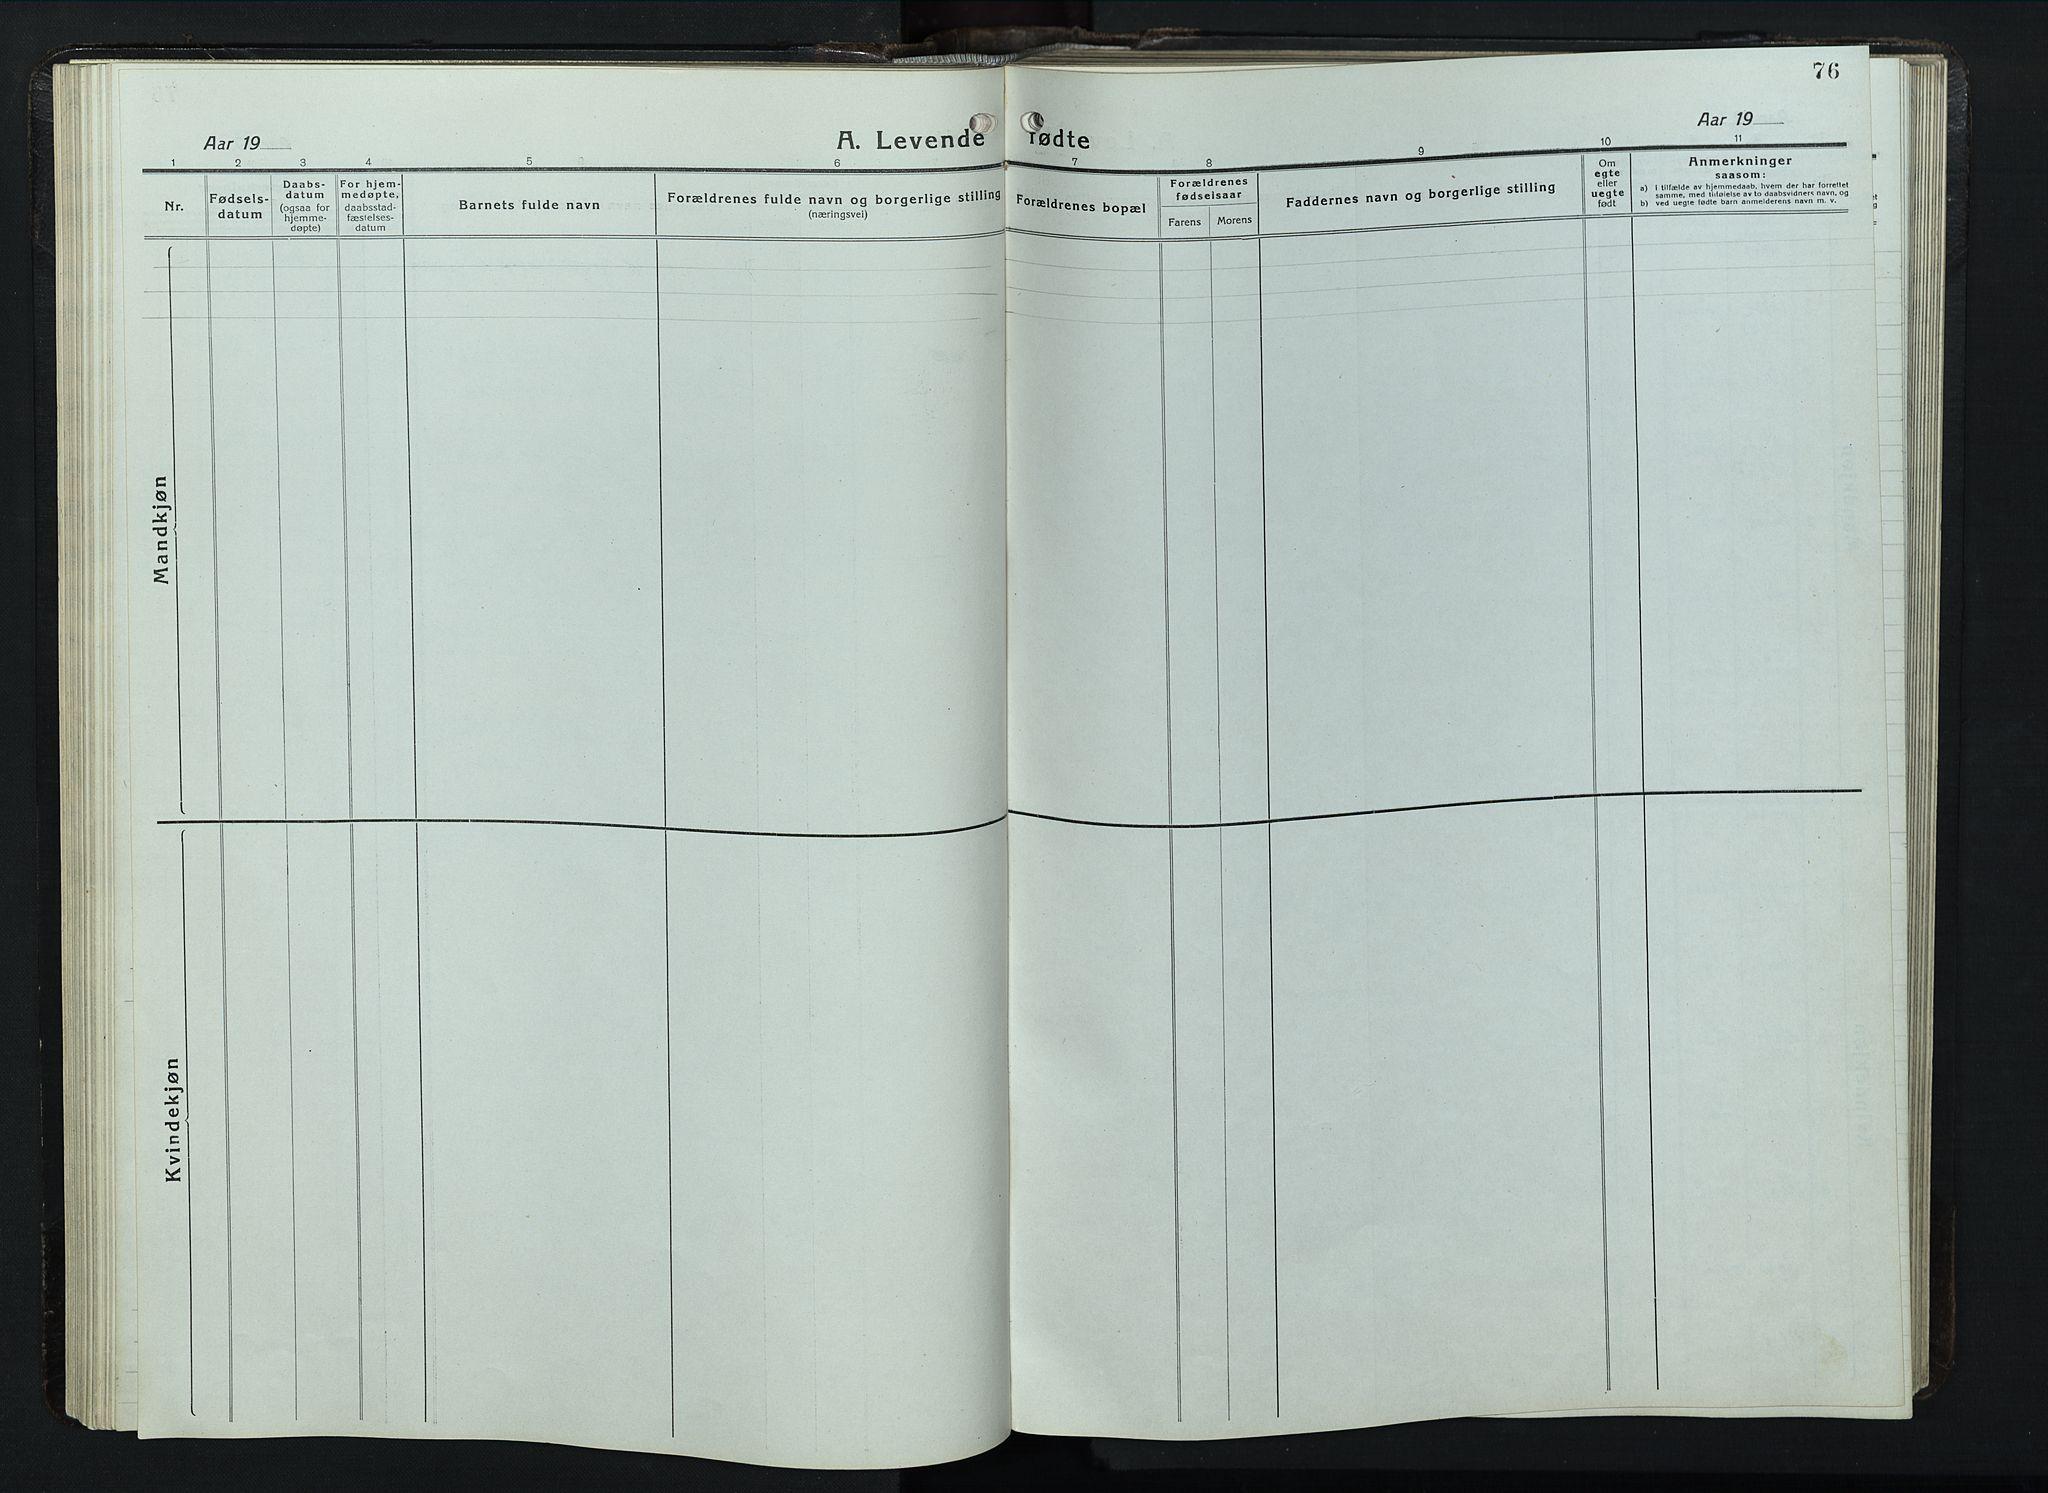 SAH, Balke prestekontor, Klokkerbok nr. 1, 1920-1955, s. 76